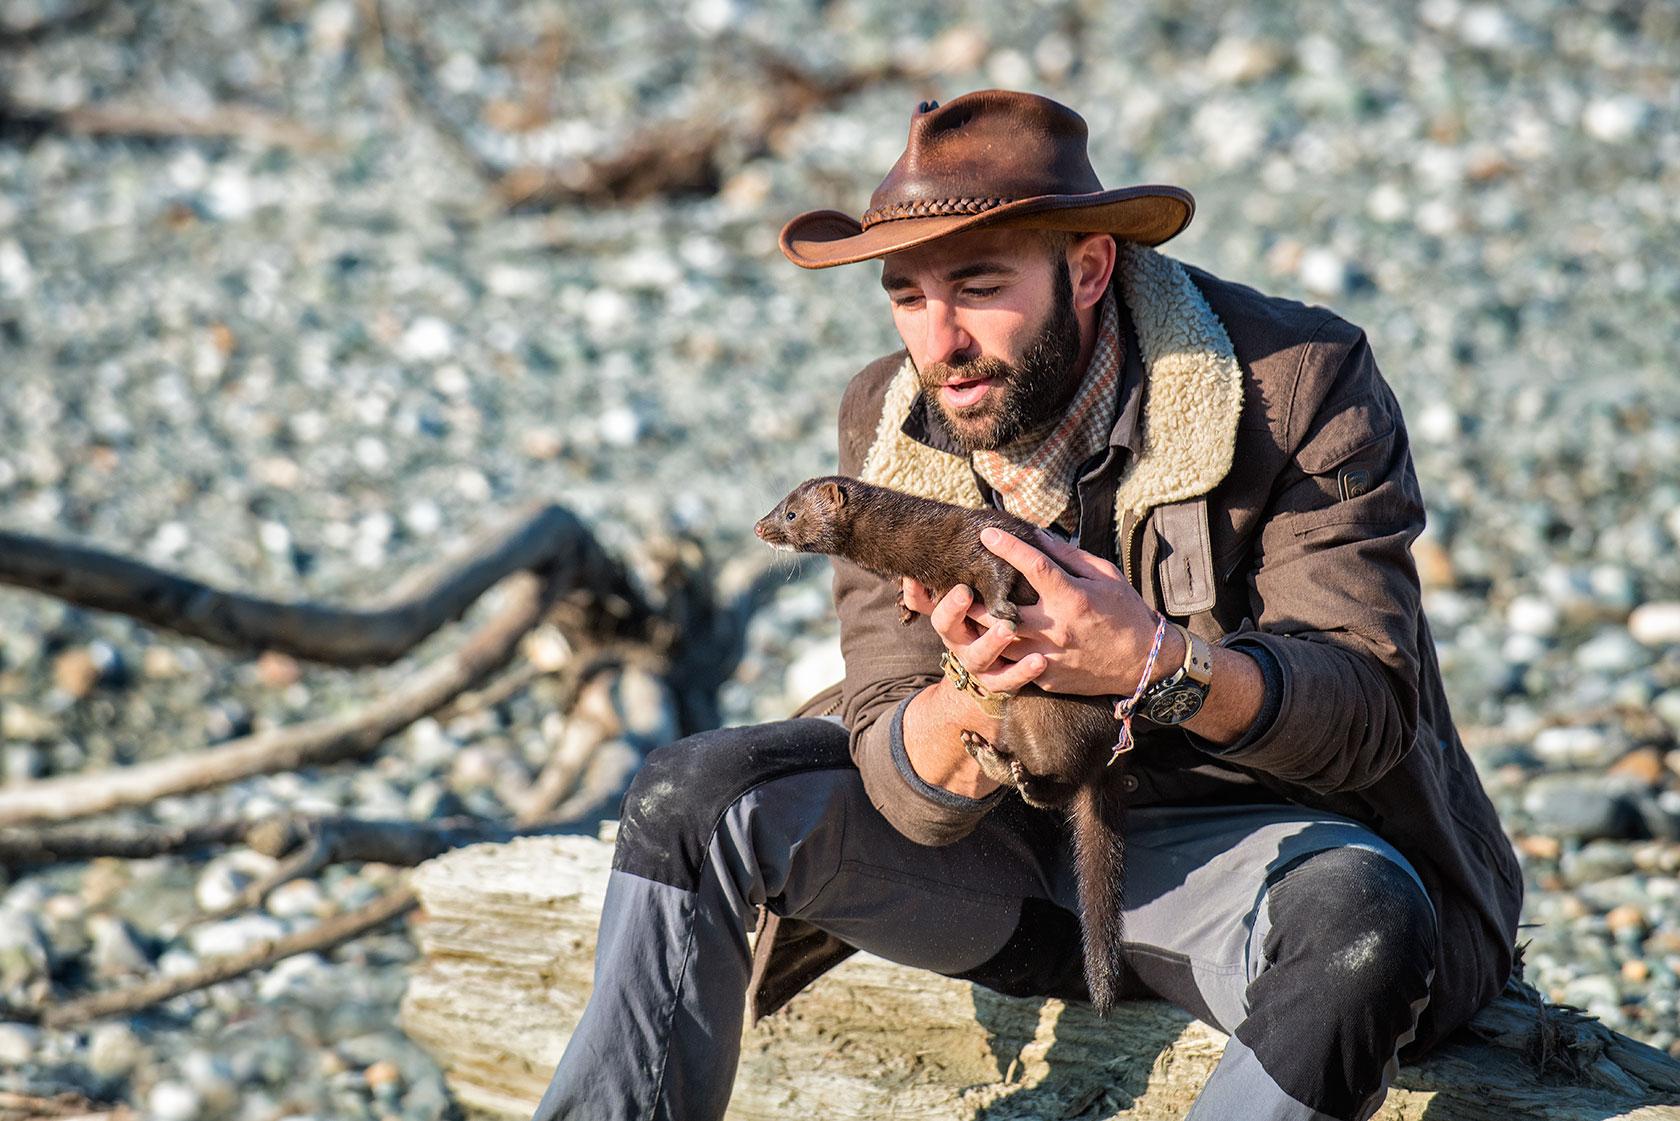 austin-trigg-brave-wilderness-alaska-BW-Coyote-Holds-Mink.jpg